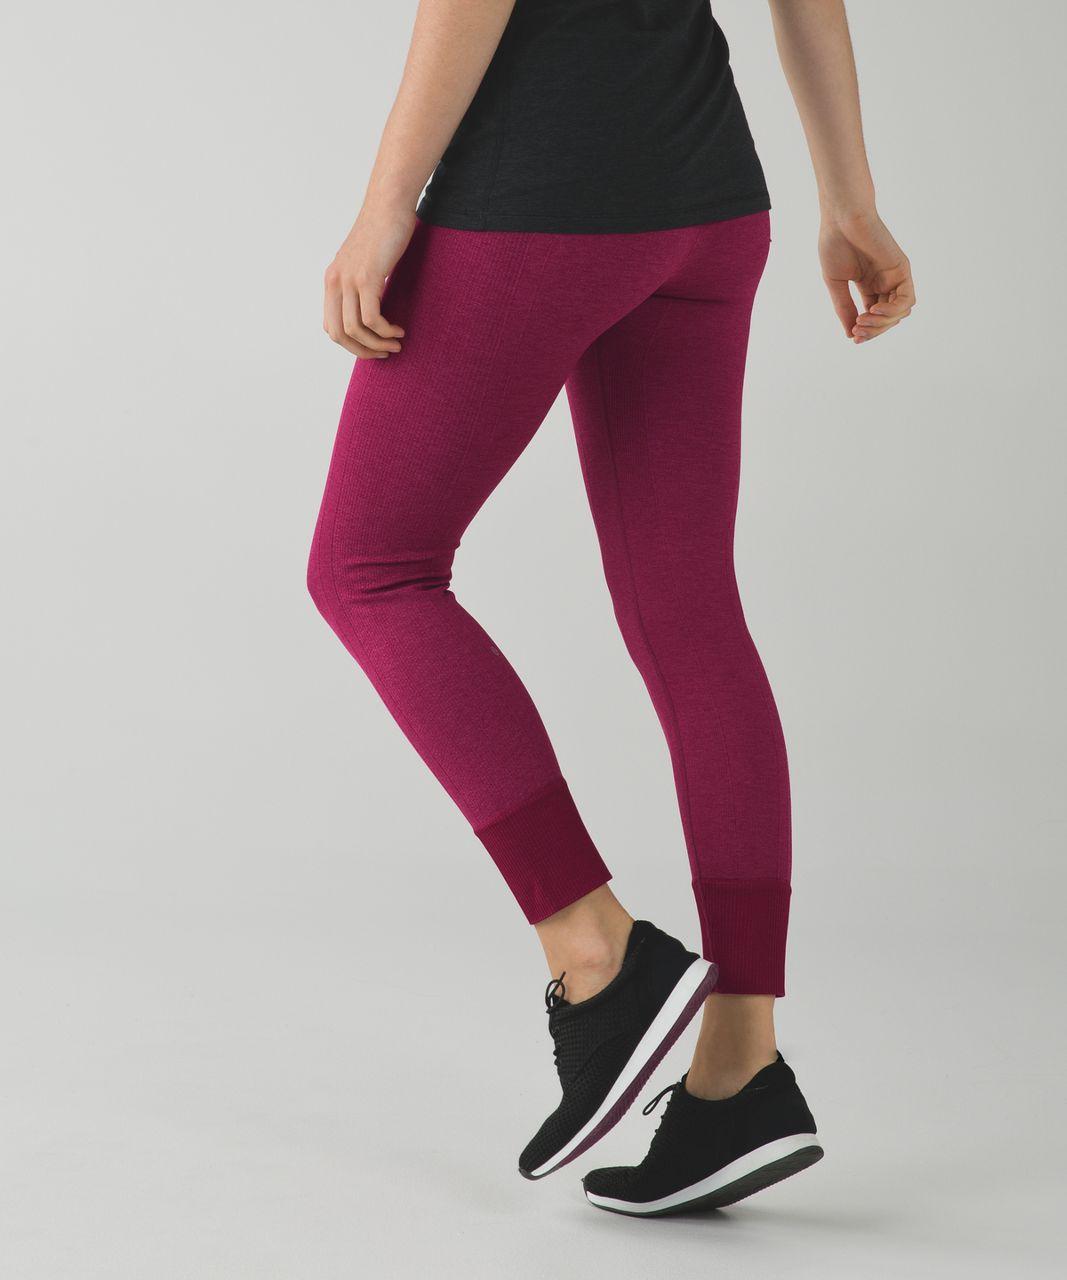 Lululemon Ebb To Street Pant - Heathered Dashing Purple